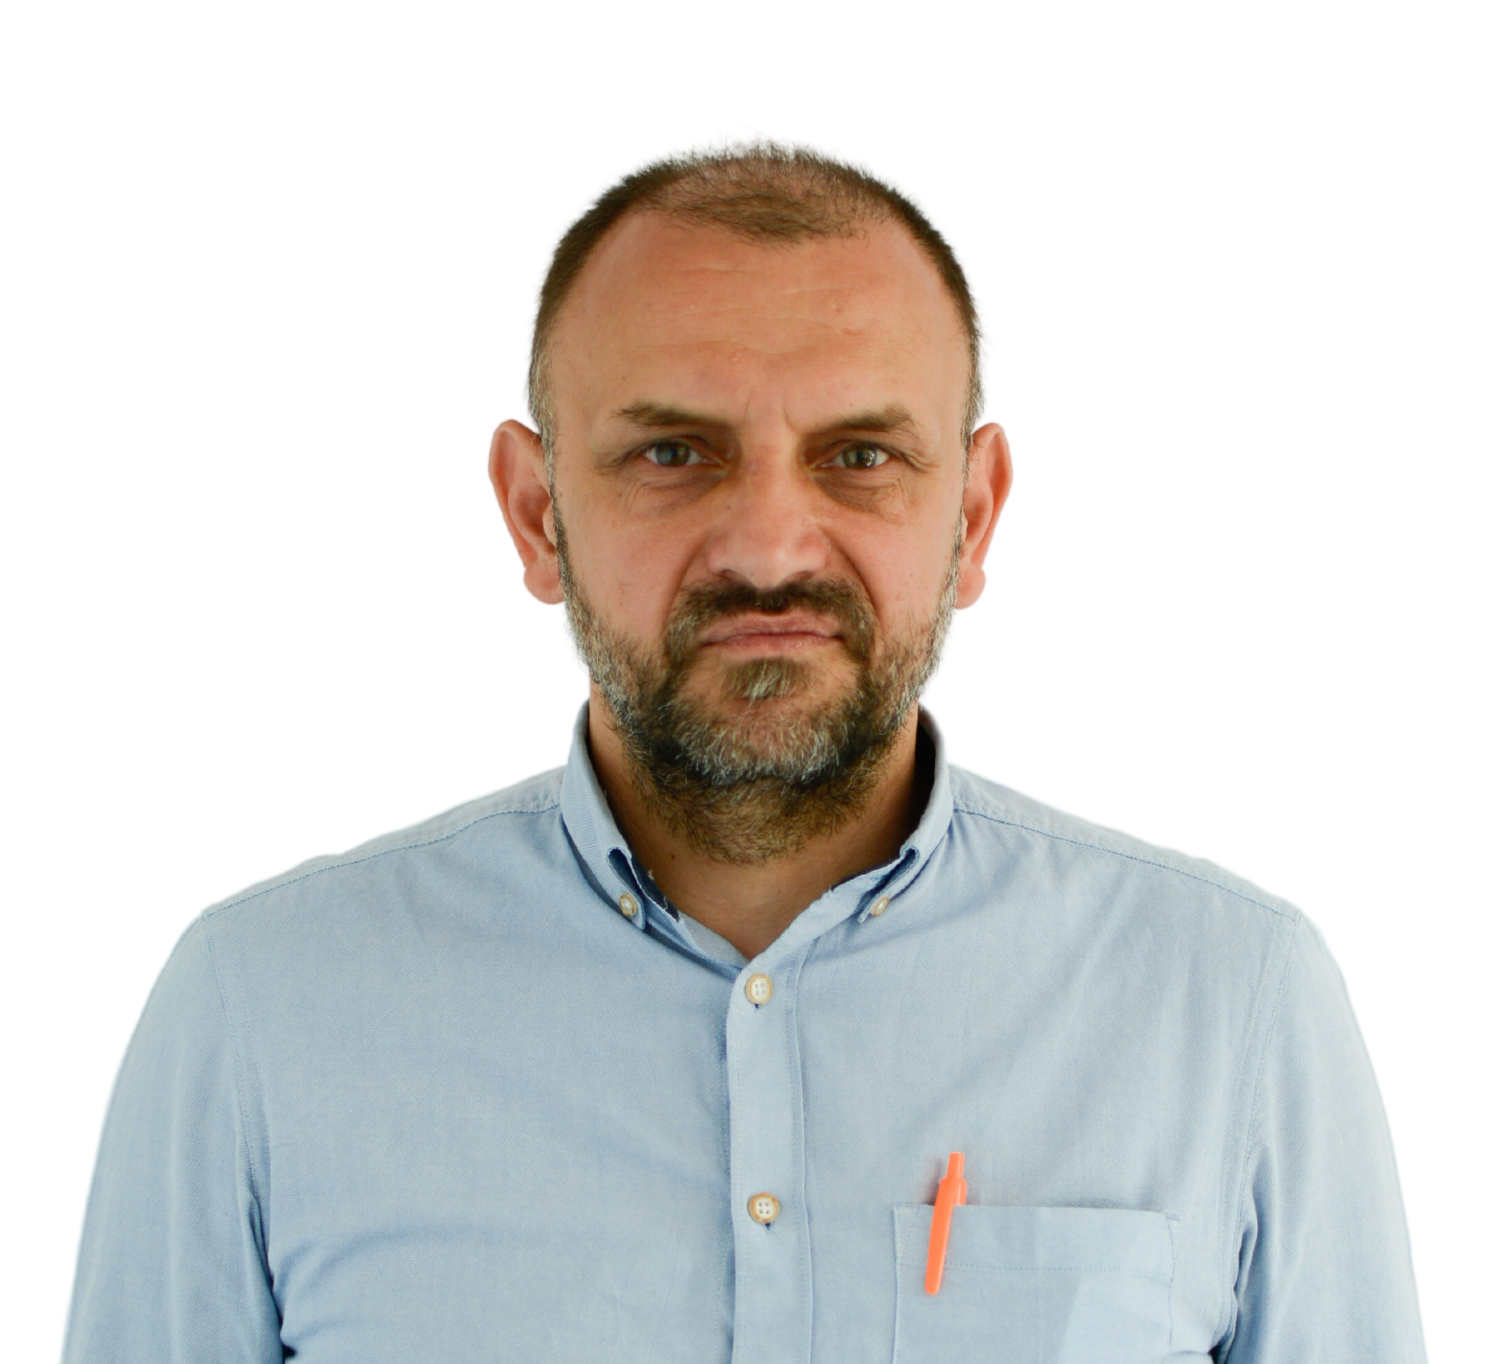 Tomasz Filarski